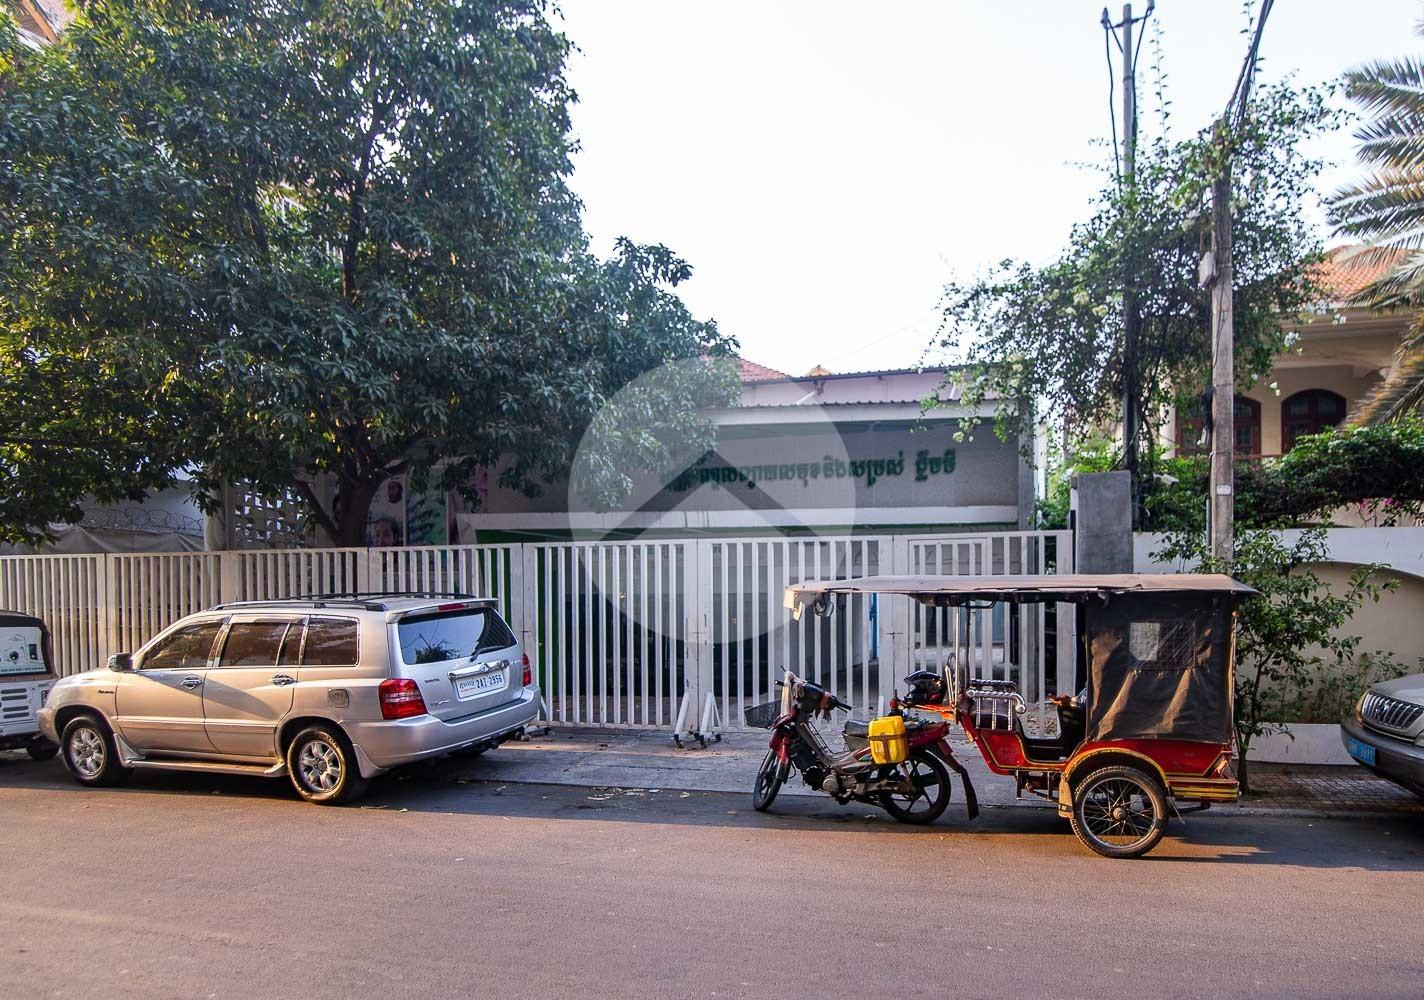 493 Sqm Commercial Space For Rent - BKK1, Phnom Penh